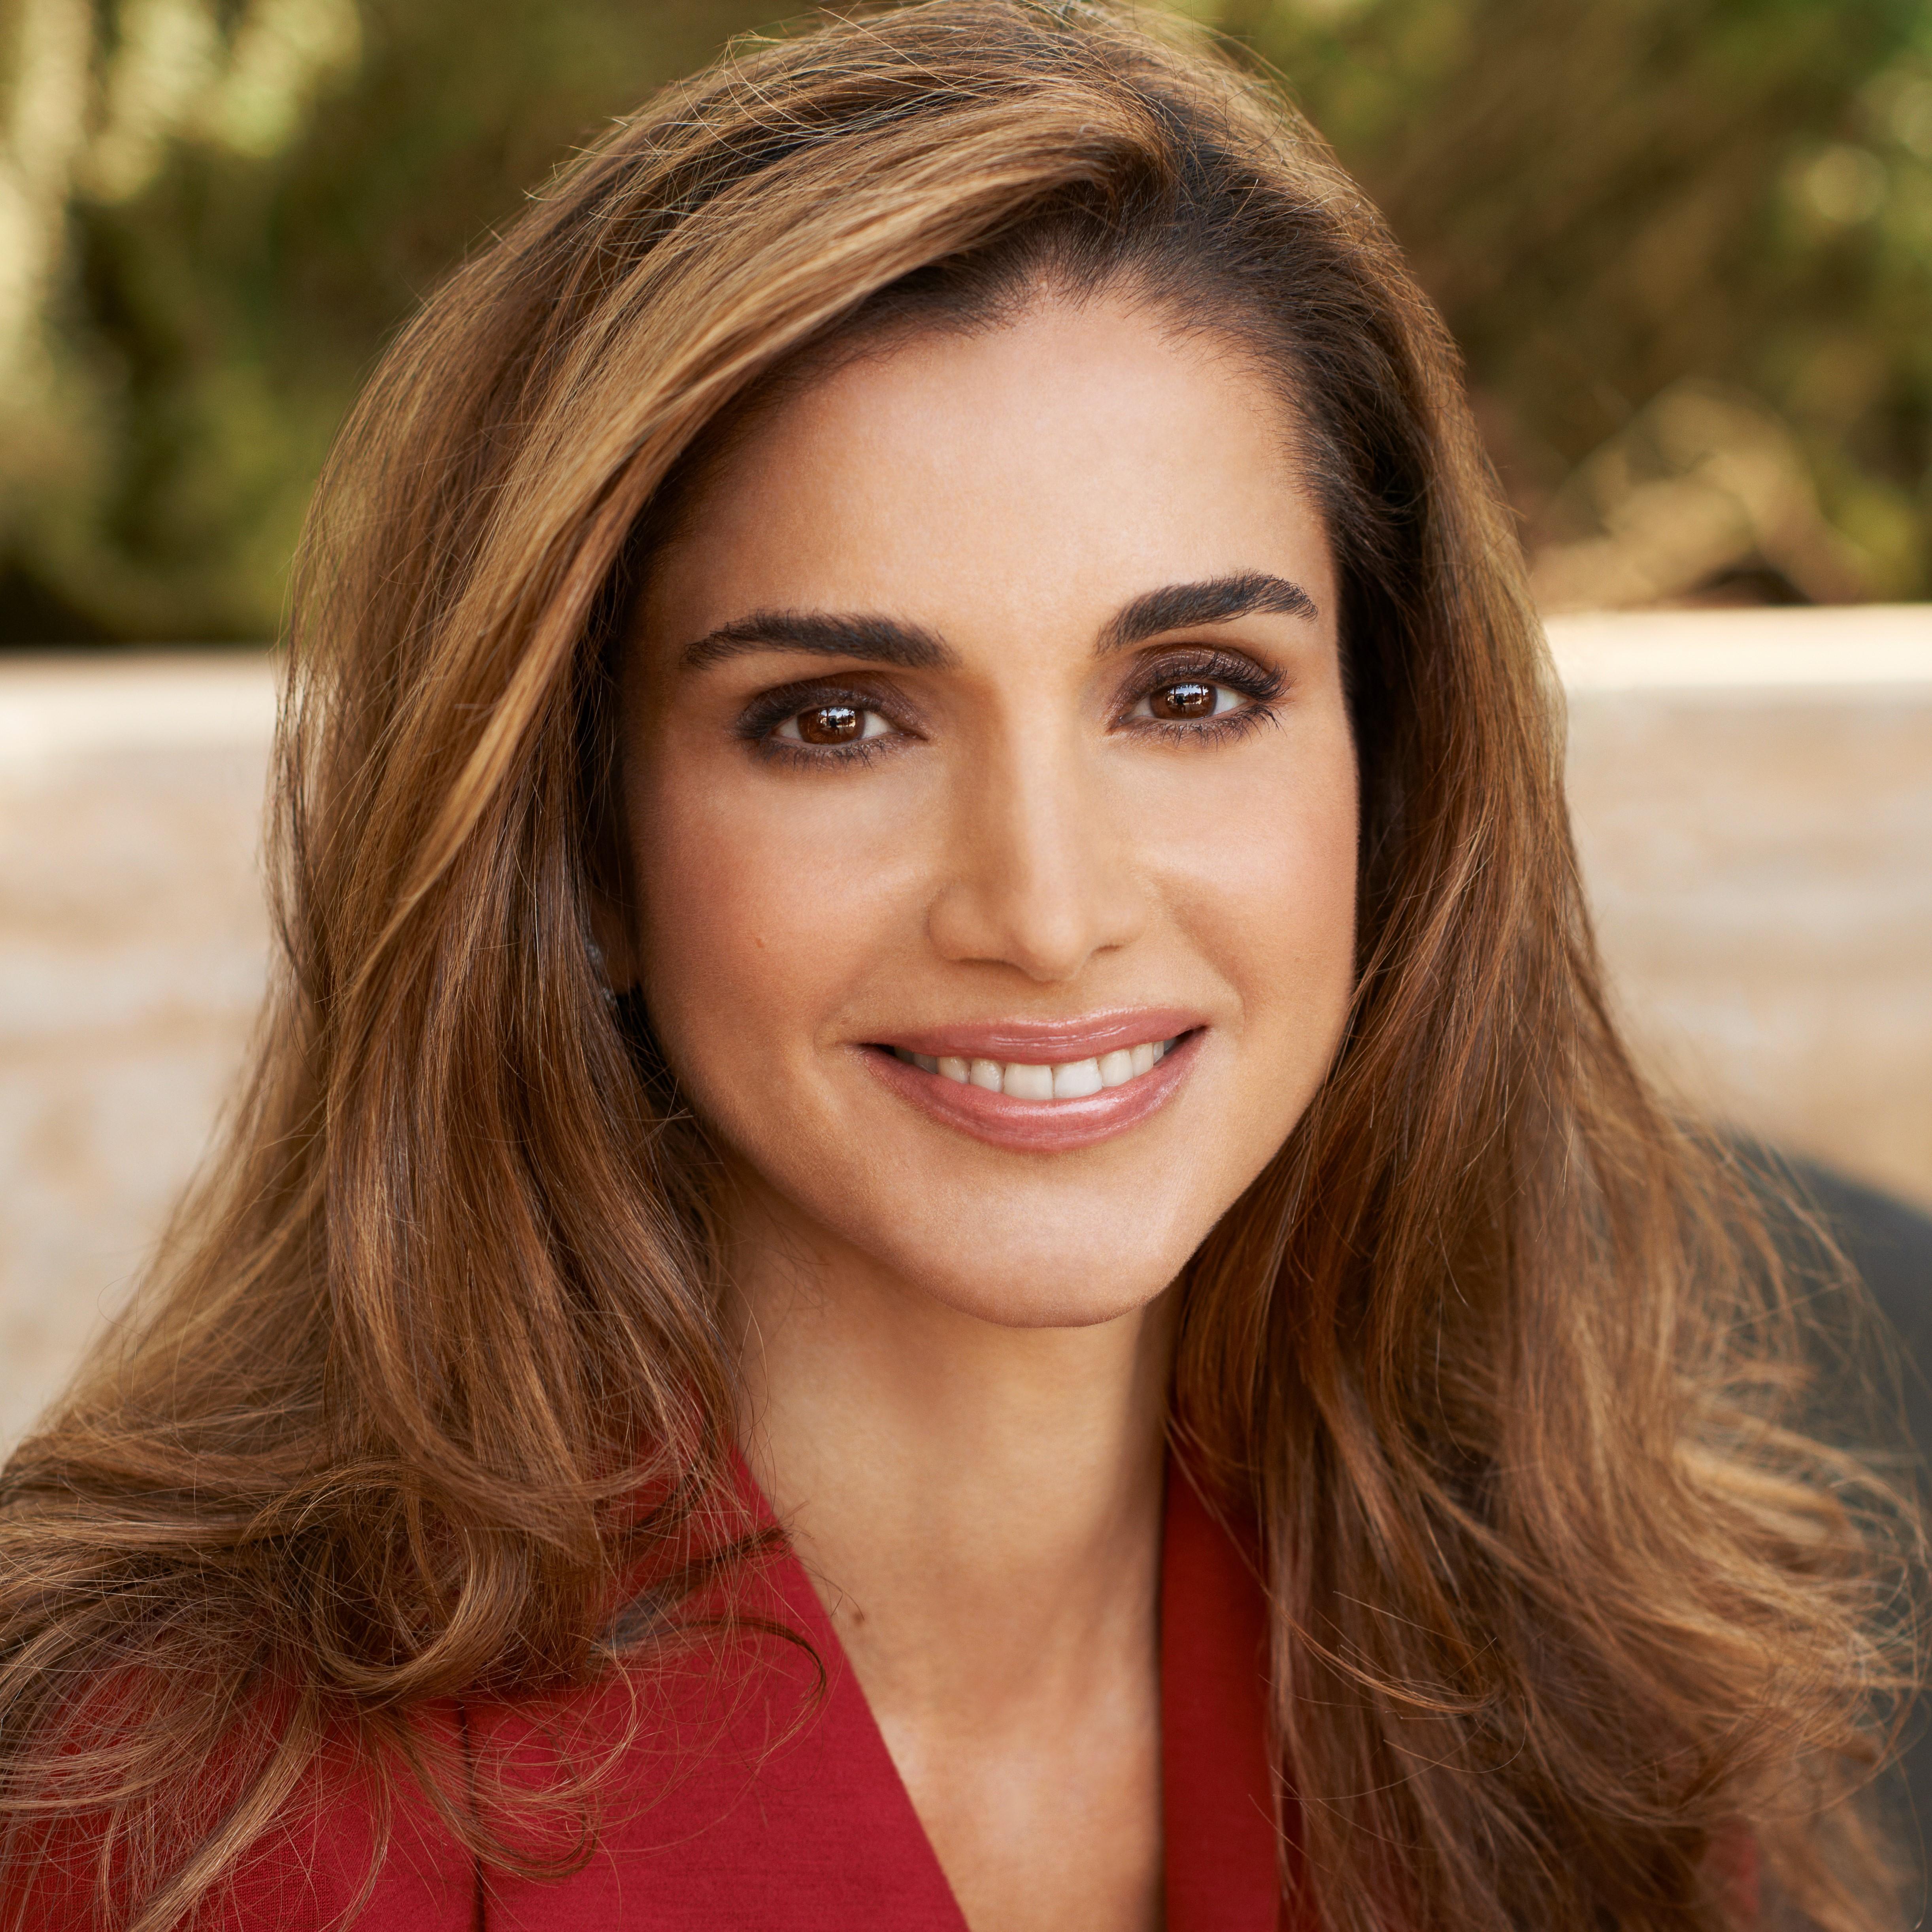 http://wtfuture.org/wp-content/uploads/2017/09/Queen-Rania.jpg